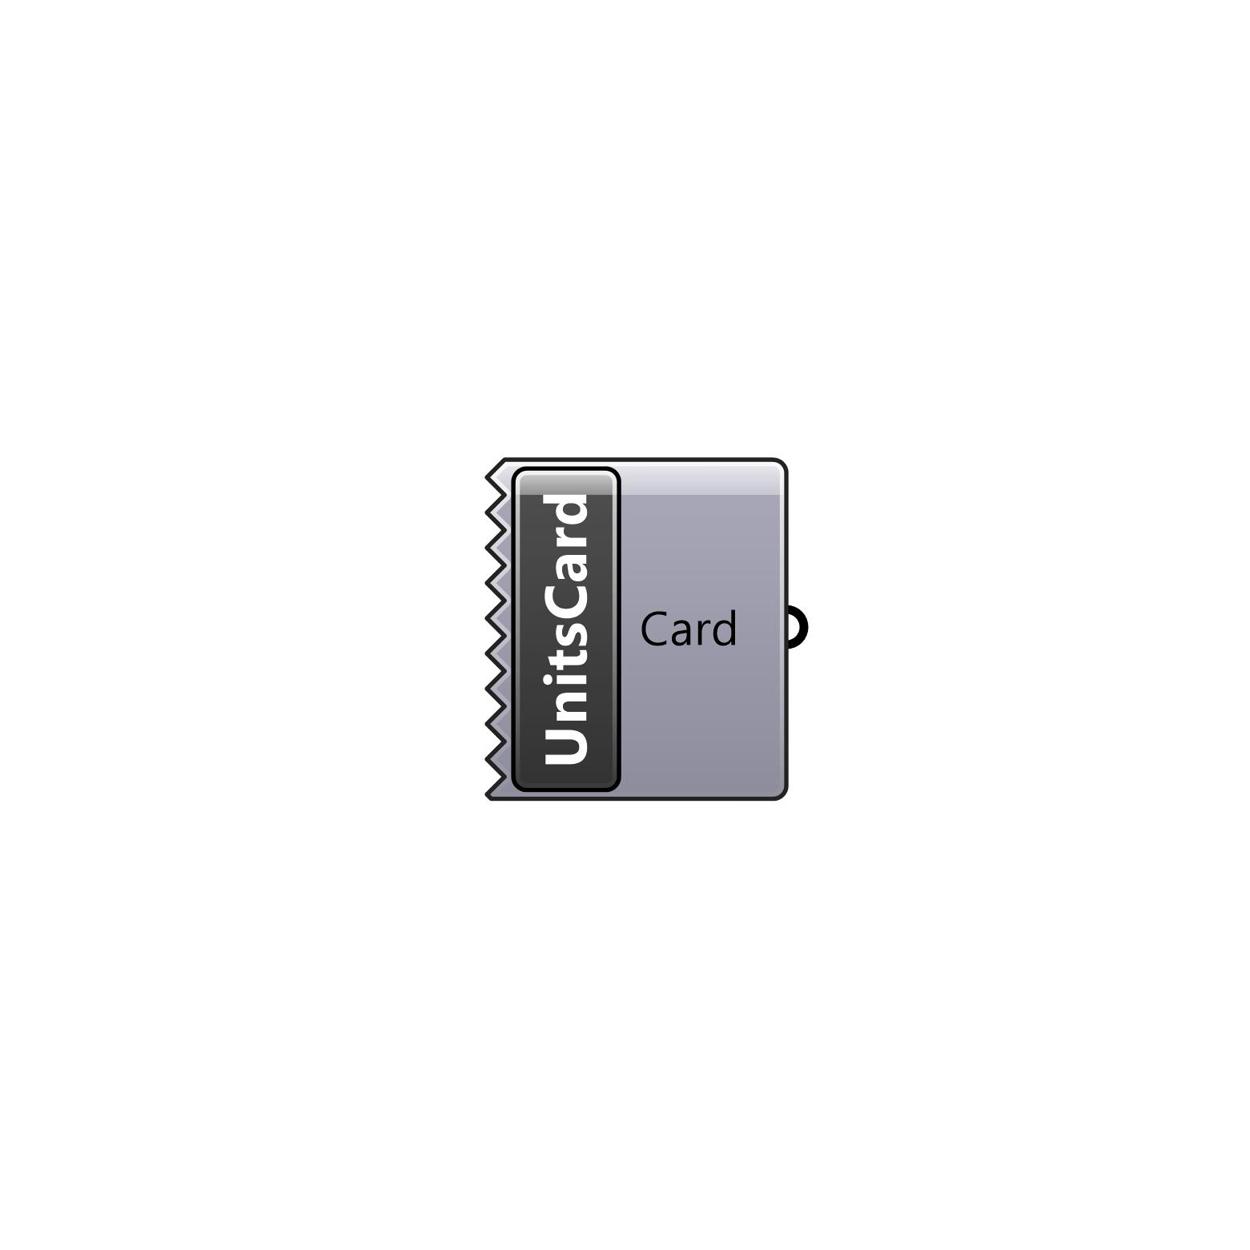 Units Card component